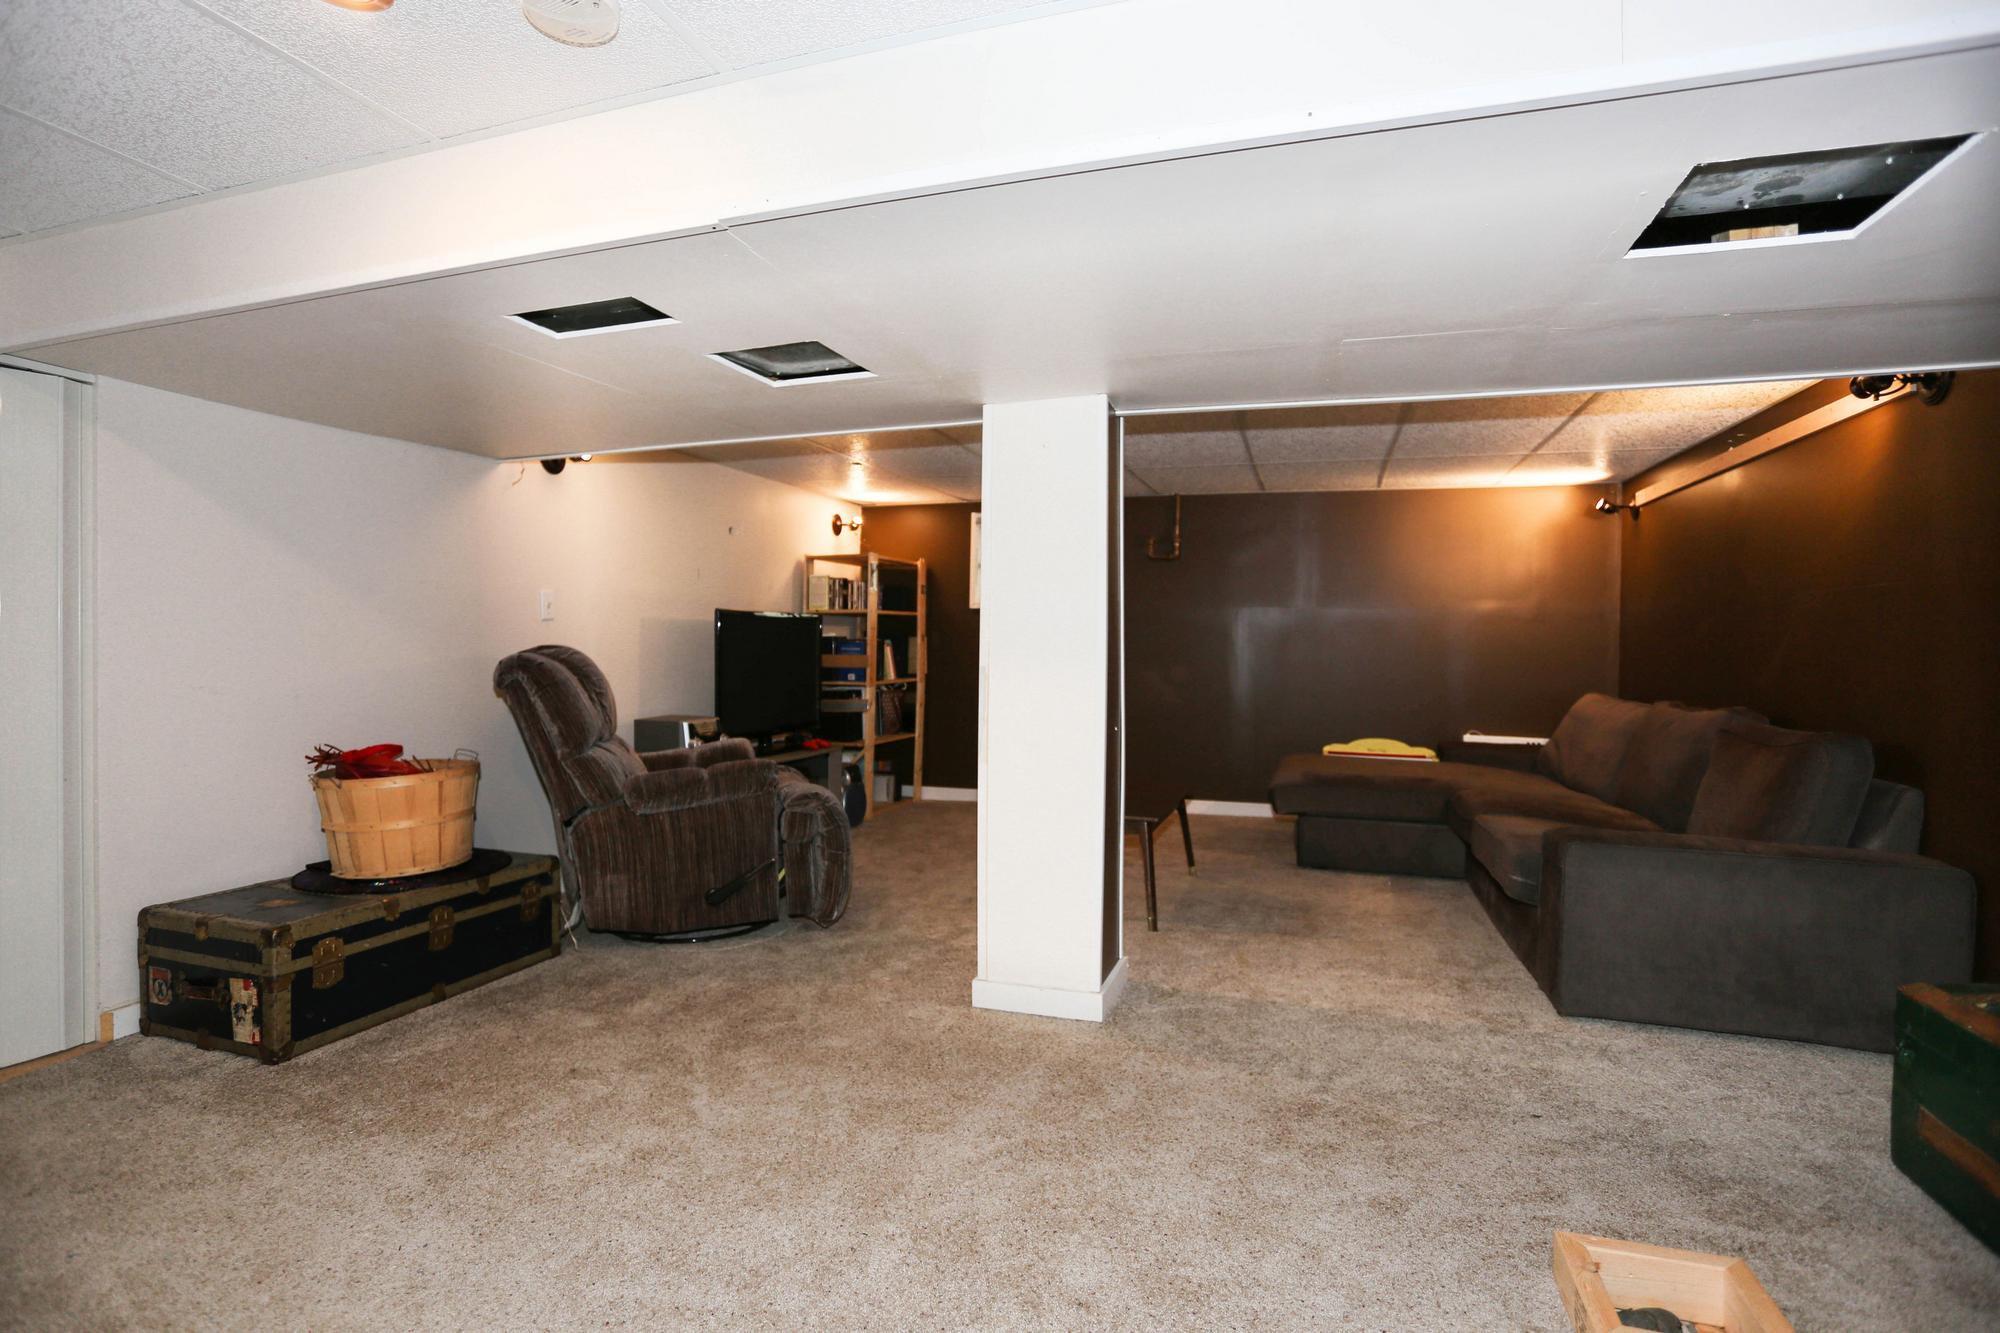 Photo 29: Photos: 105 Evanson Street in Winnipeg: Wolseley Single Family Detached for sale (5B)  : MLS®# 1821900